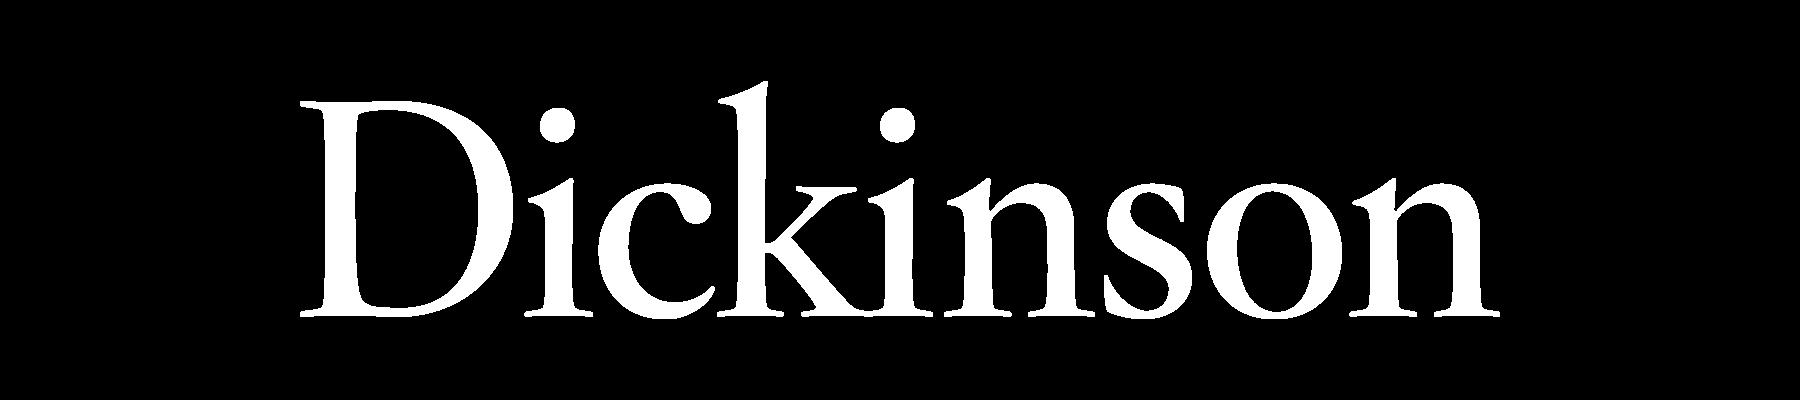 Dickinson logo